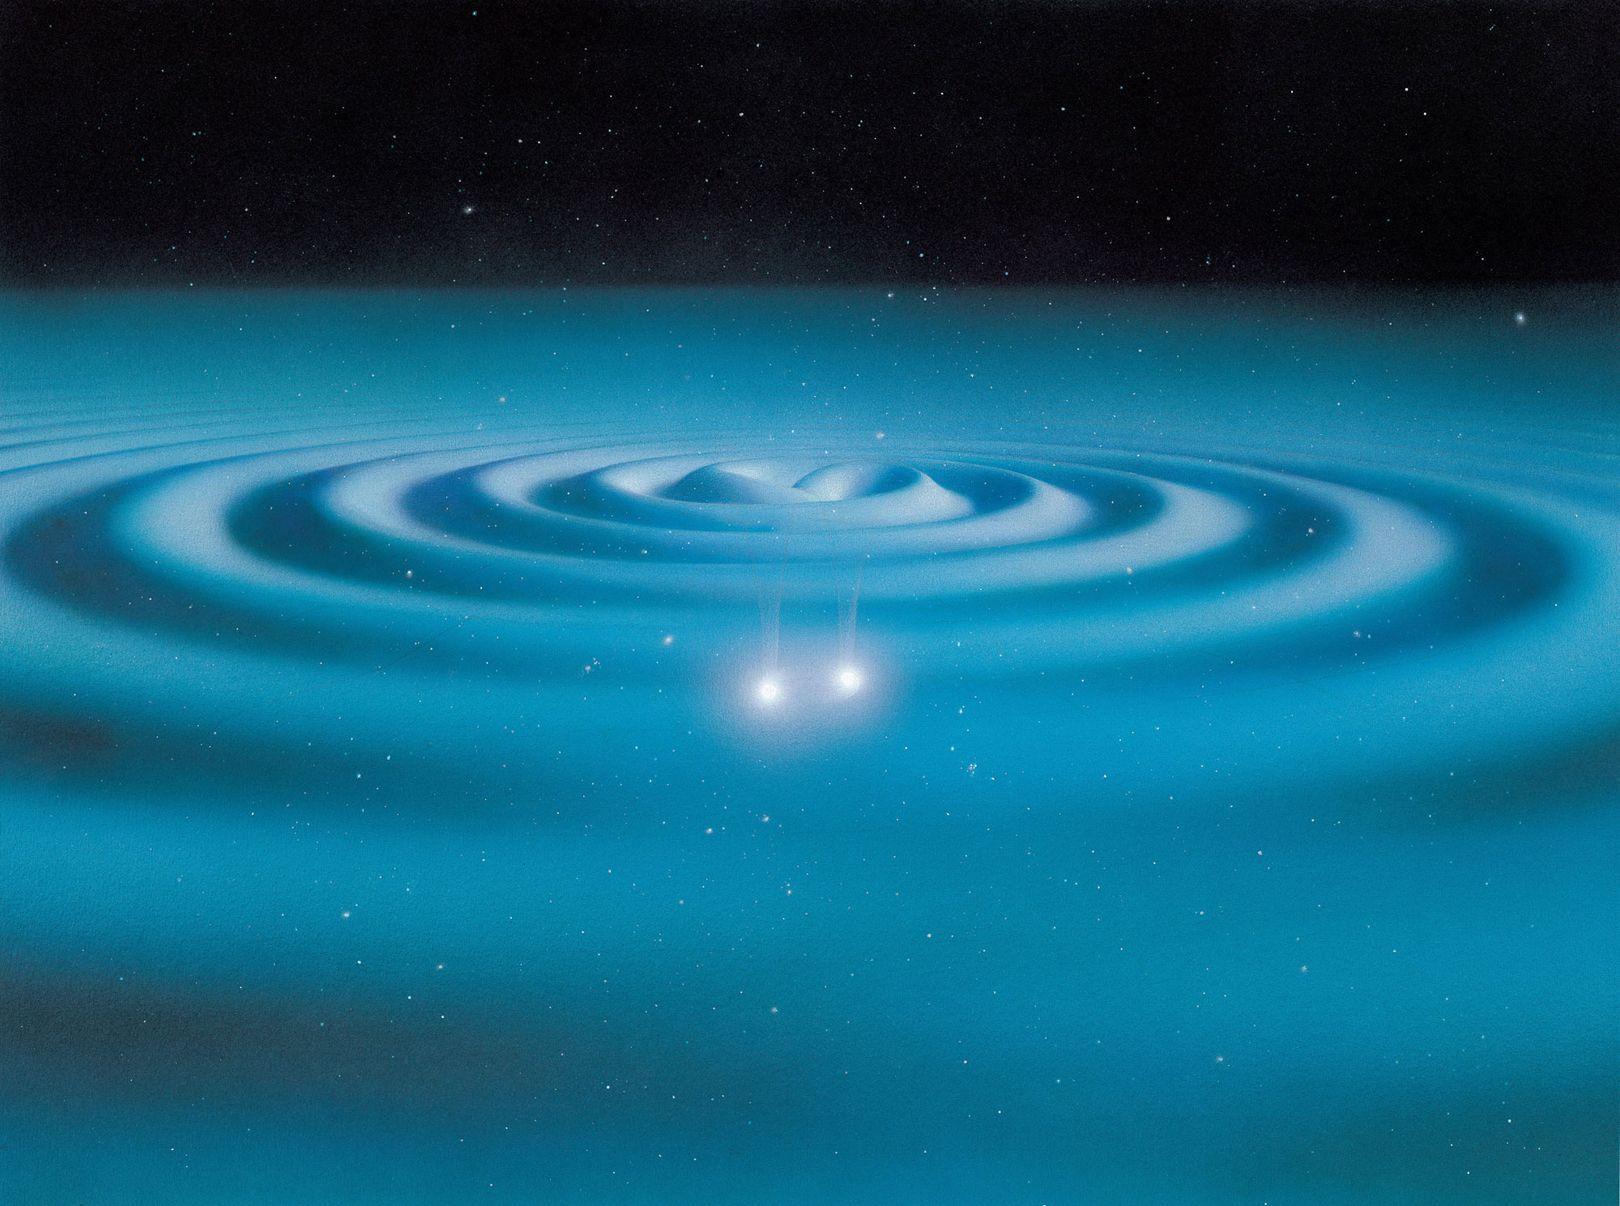 Onde gravitationnelle - 3